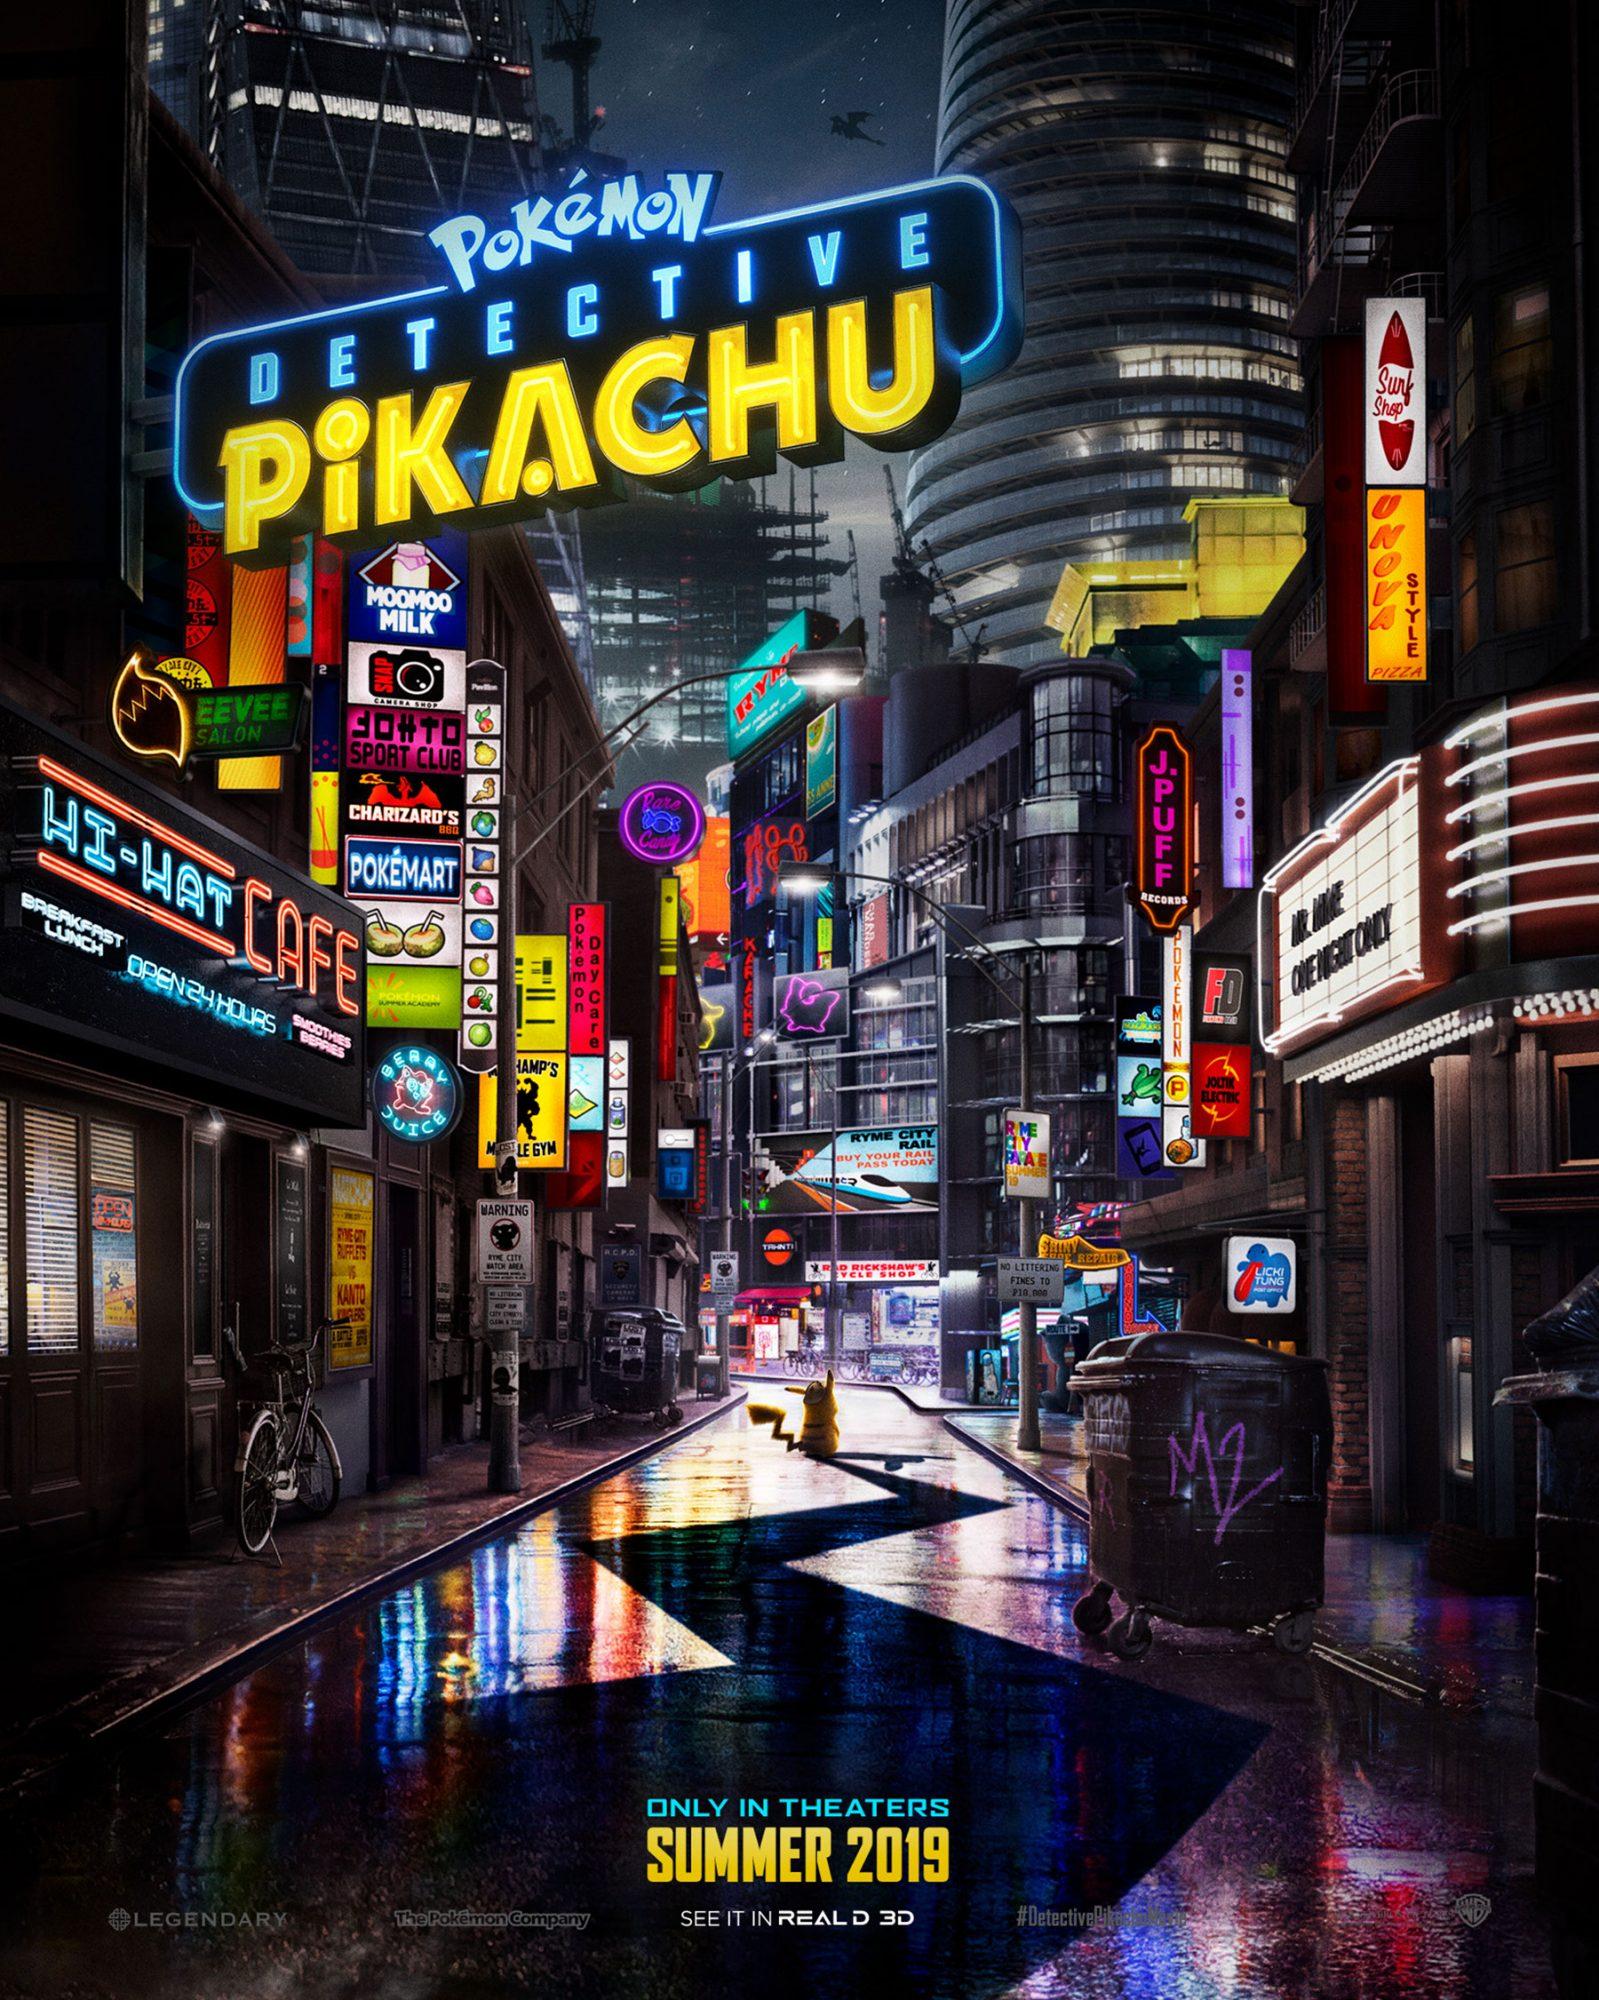 POKÉMON Detective Pikachu (2019) movie posterCR: Warner Bros. Pictures